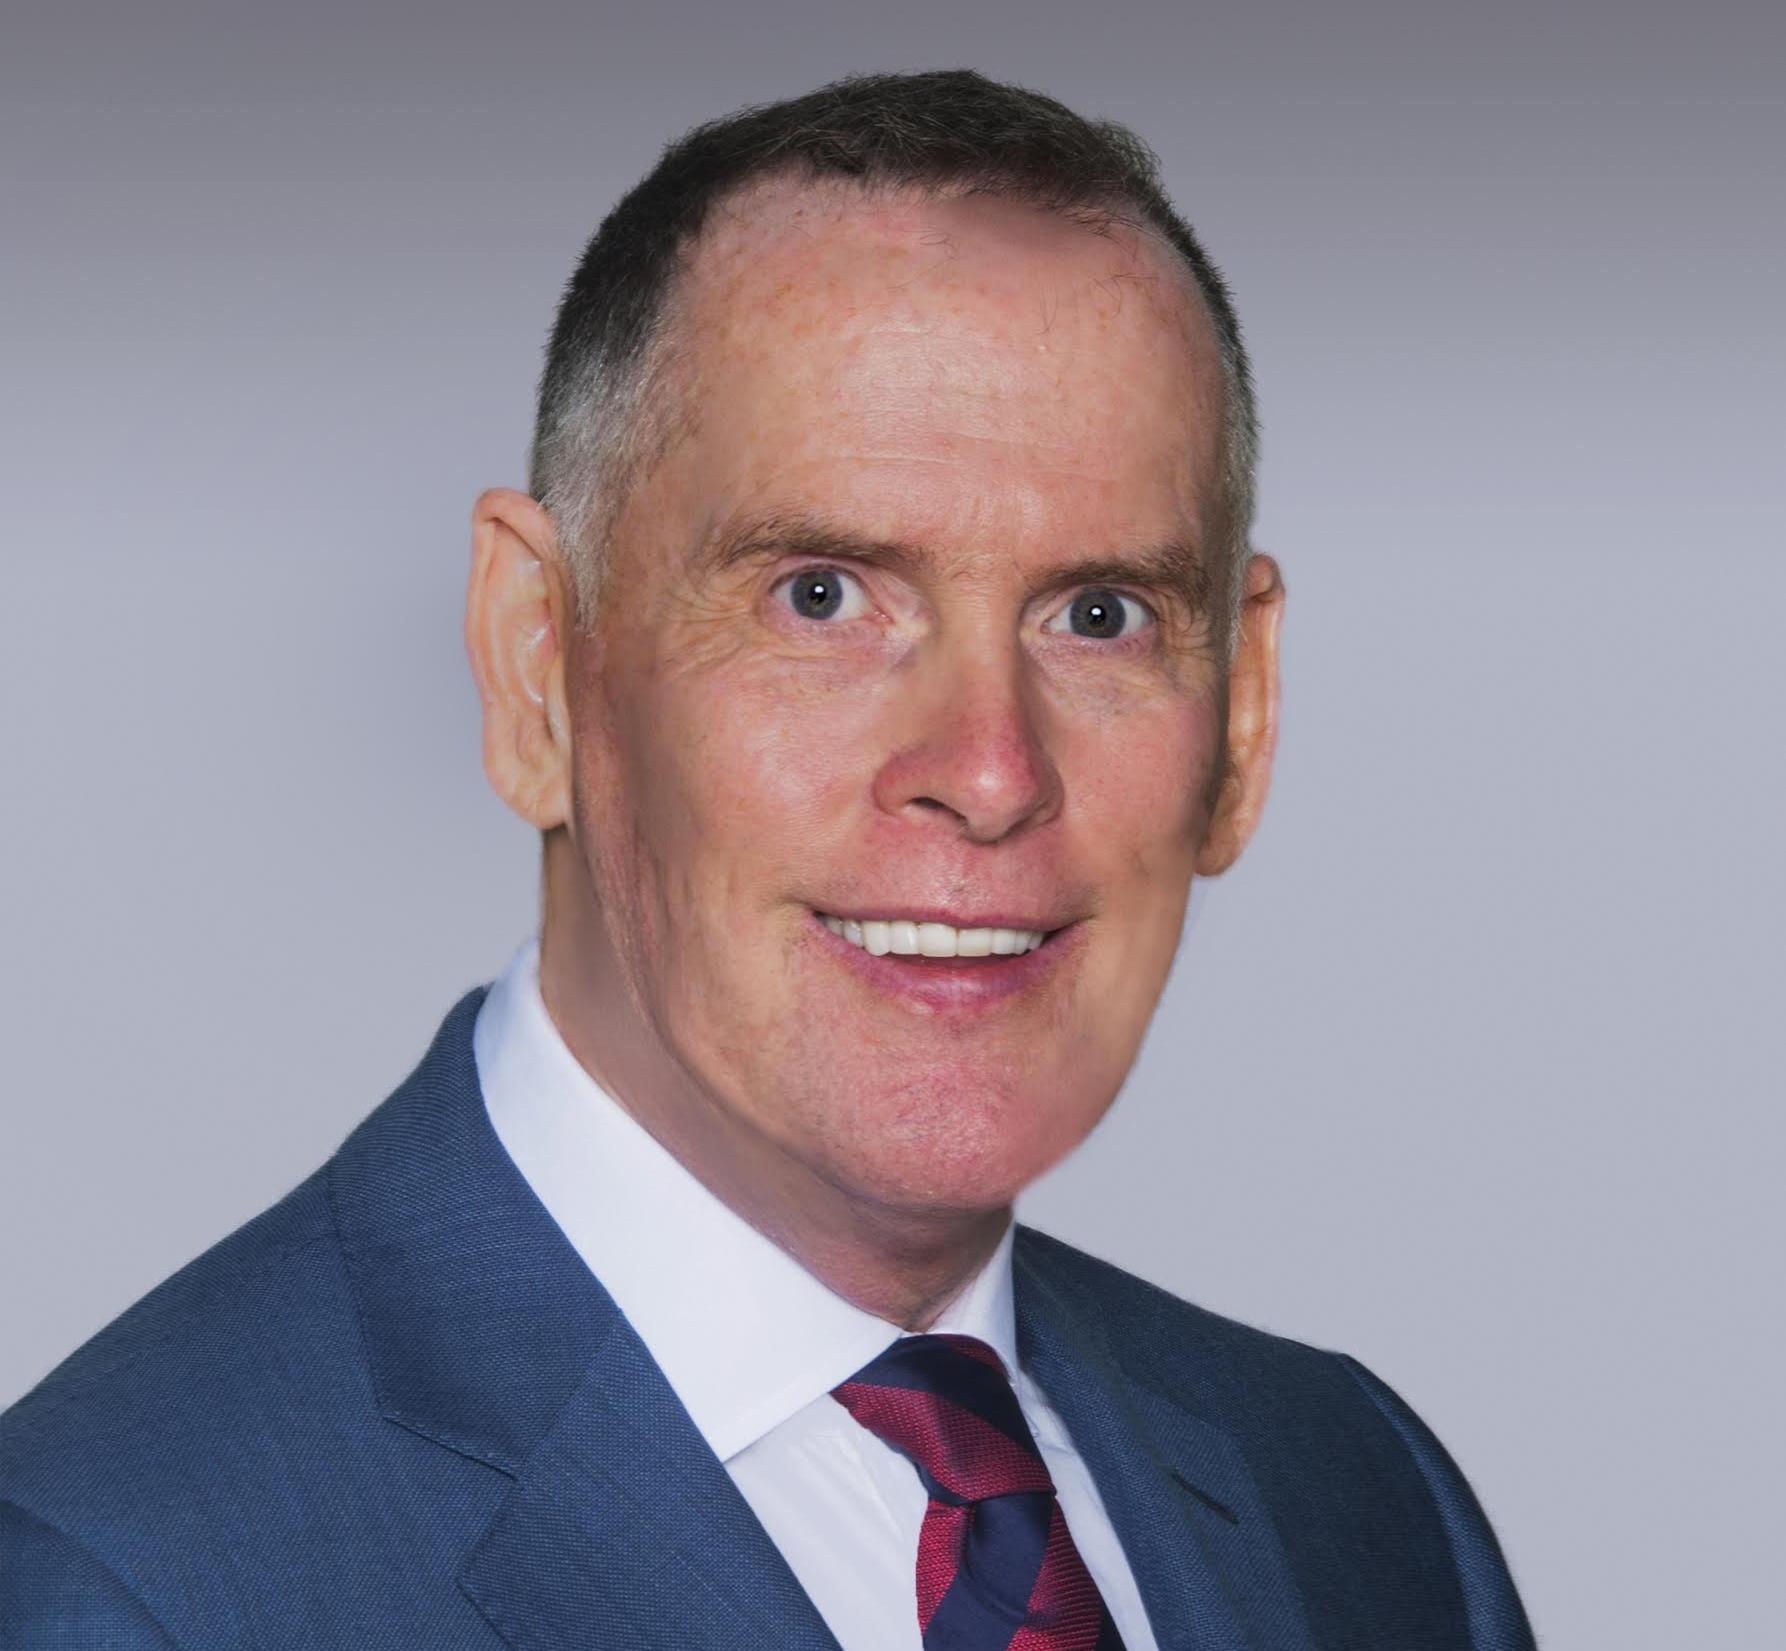 Thomas Graham, Senior Vice President of Landsea Homes